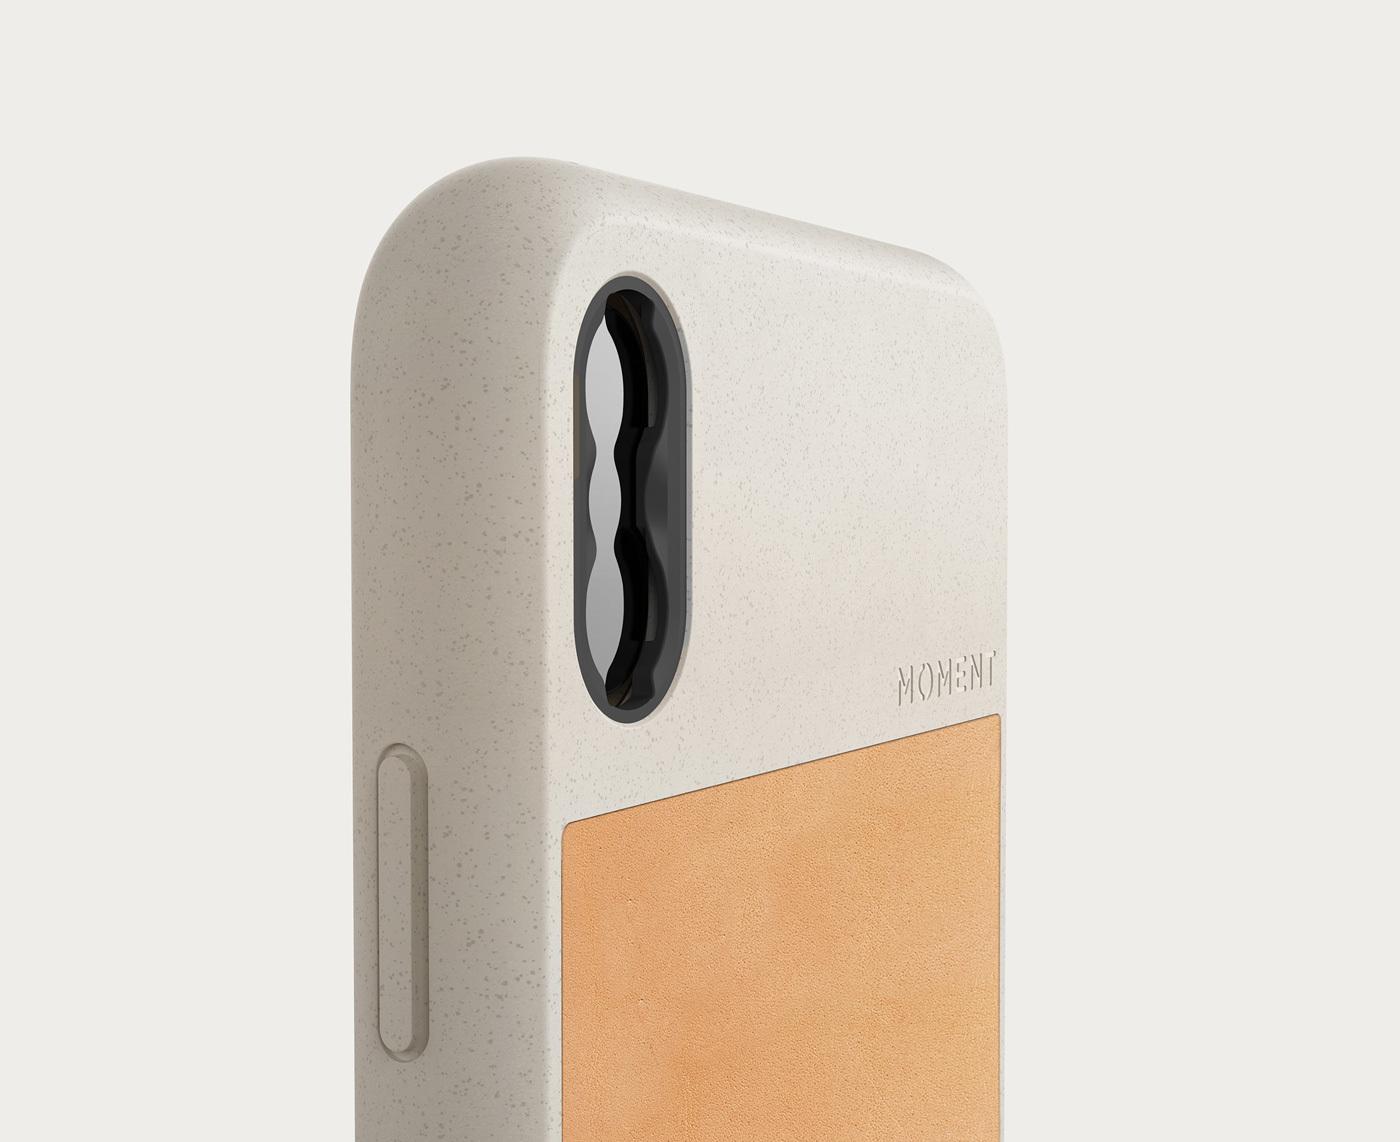 new concept 85392 64af2 iPhone Photo Case   iPhone X - Black Canvas